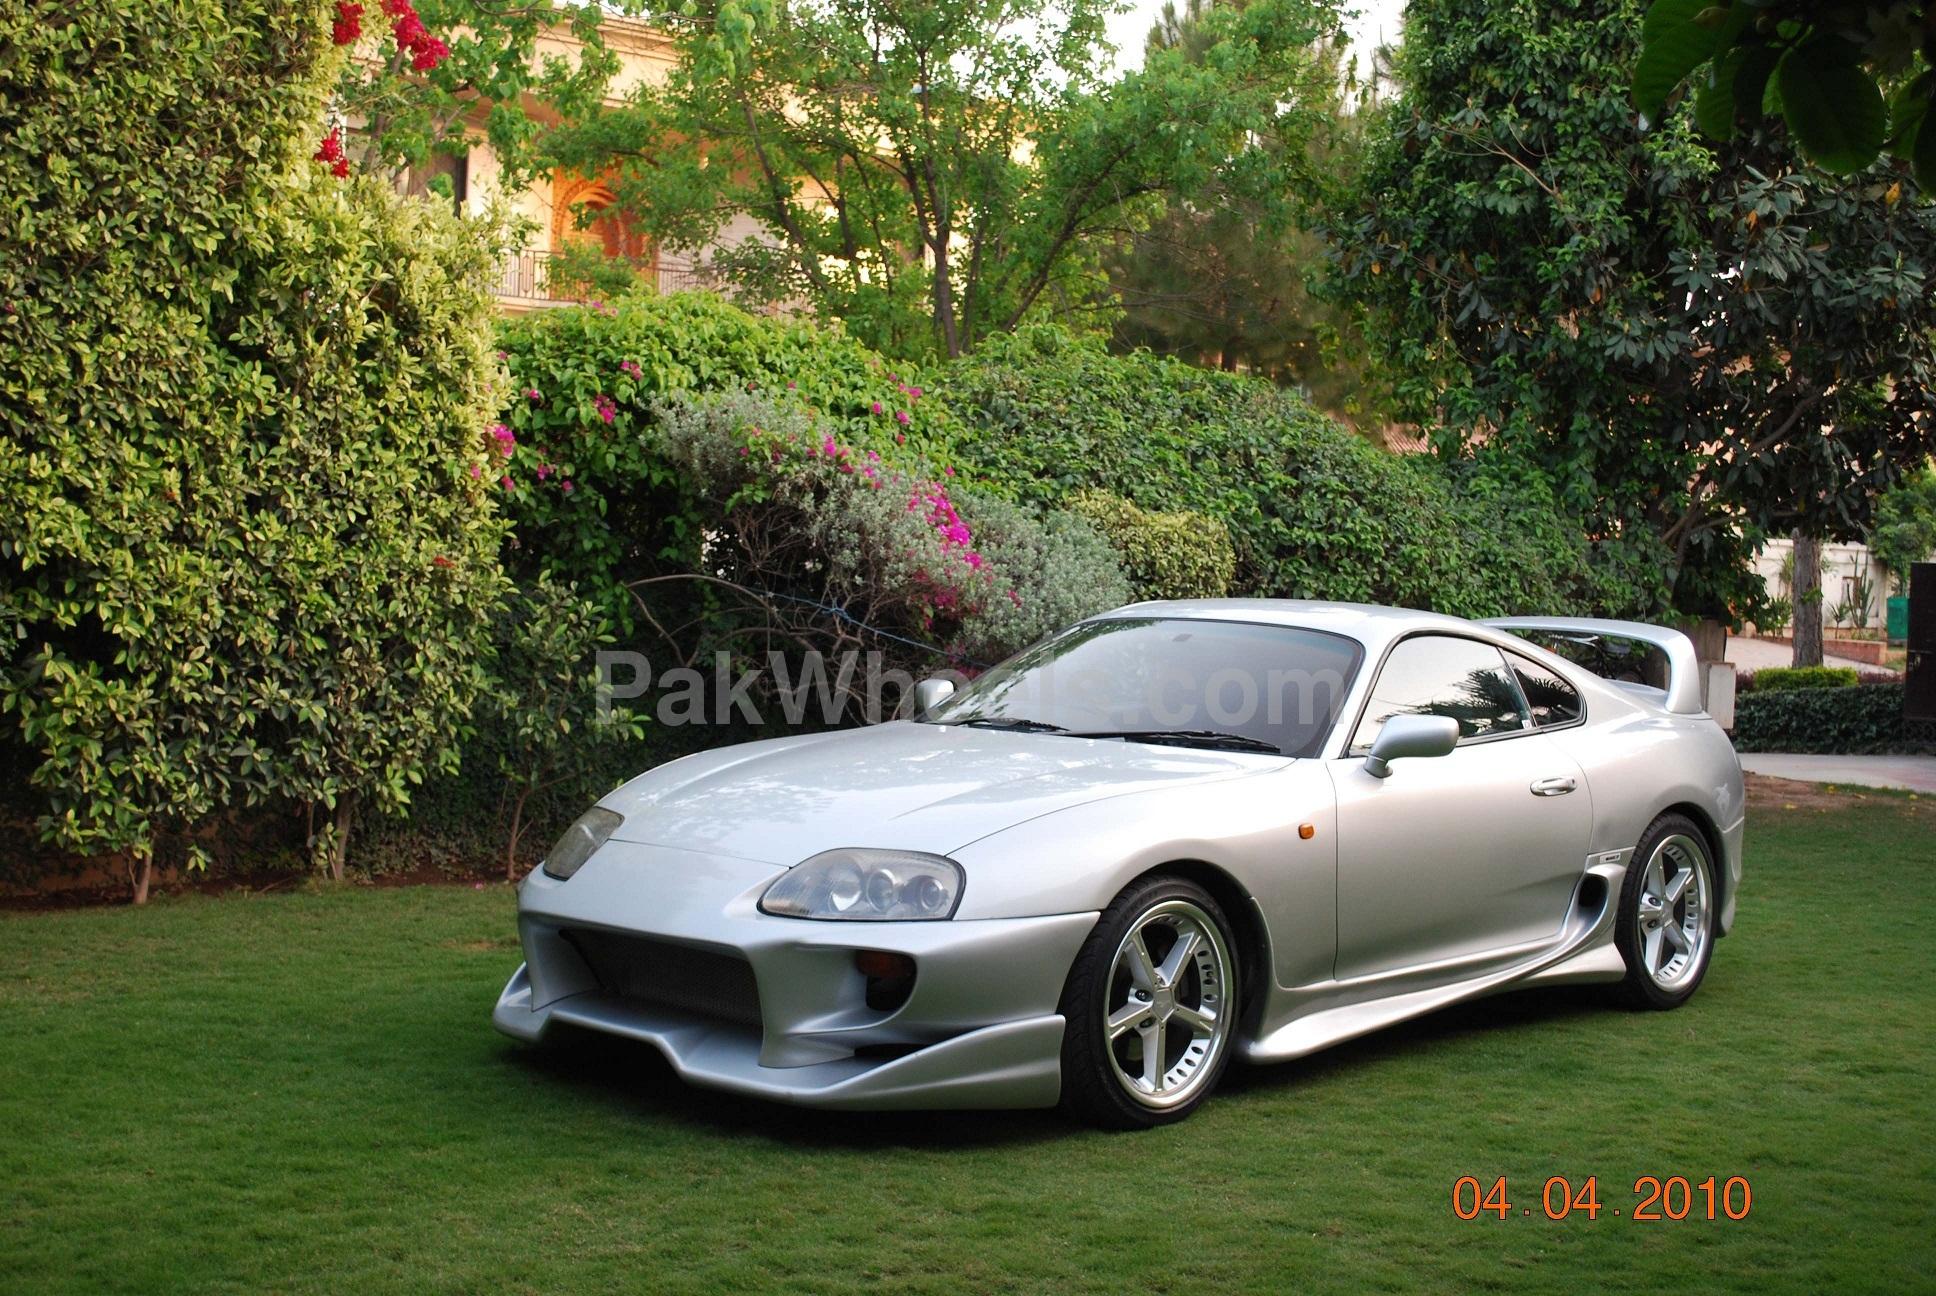 Toyota Supra For Sale In Islamabad PakWheels - Sports cars for sale in islamabad